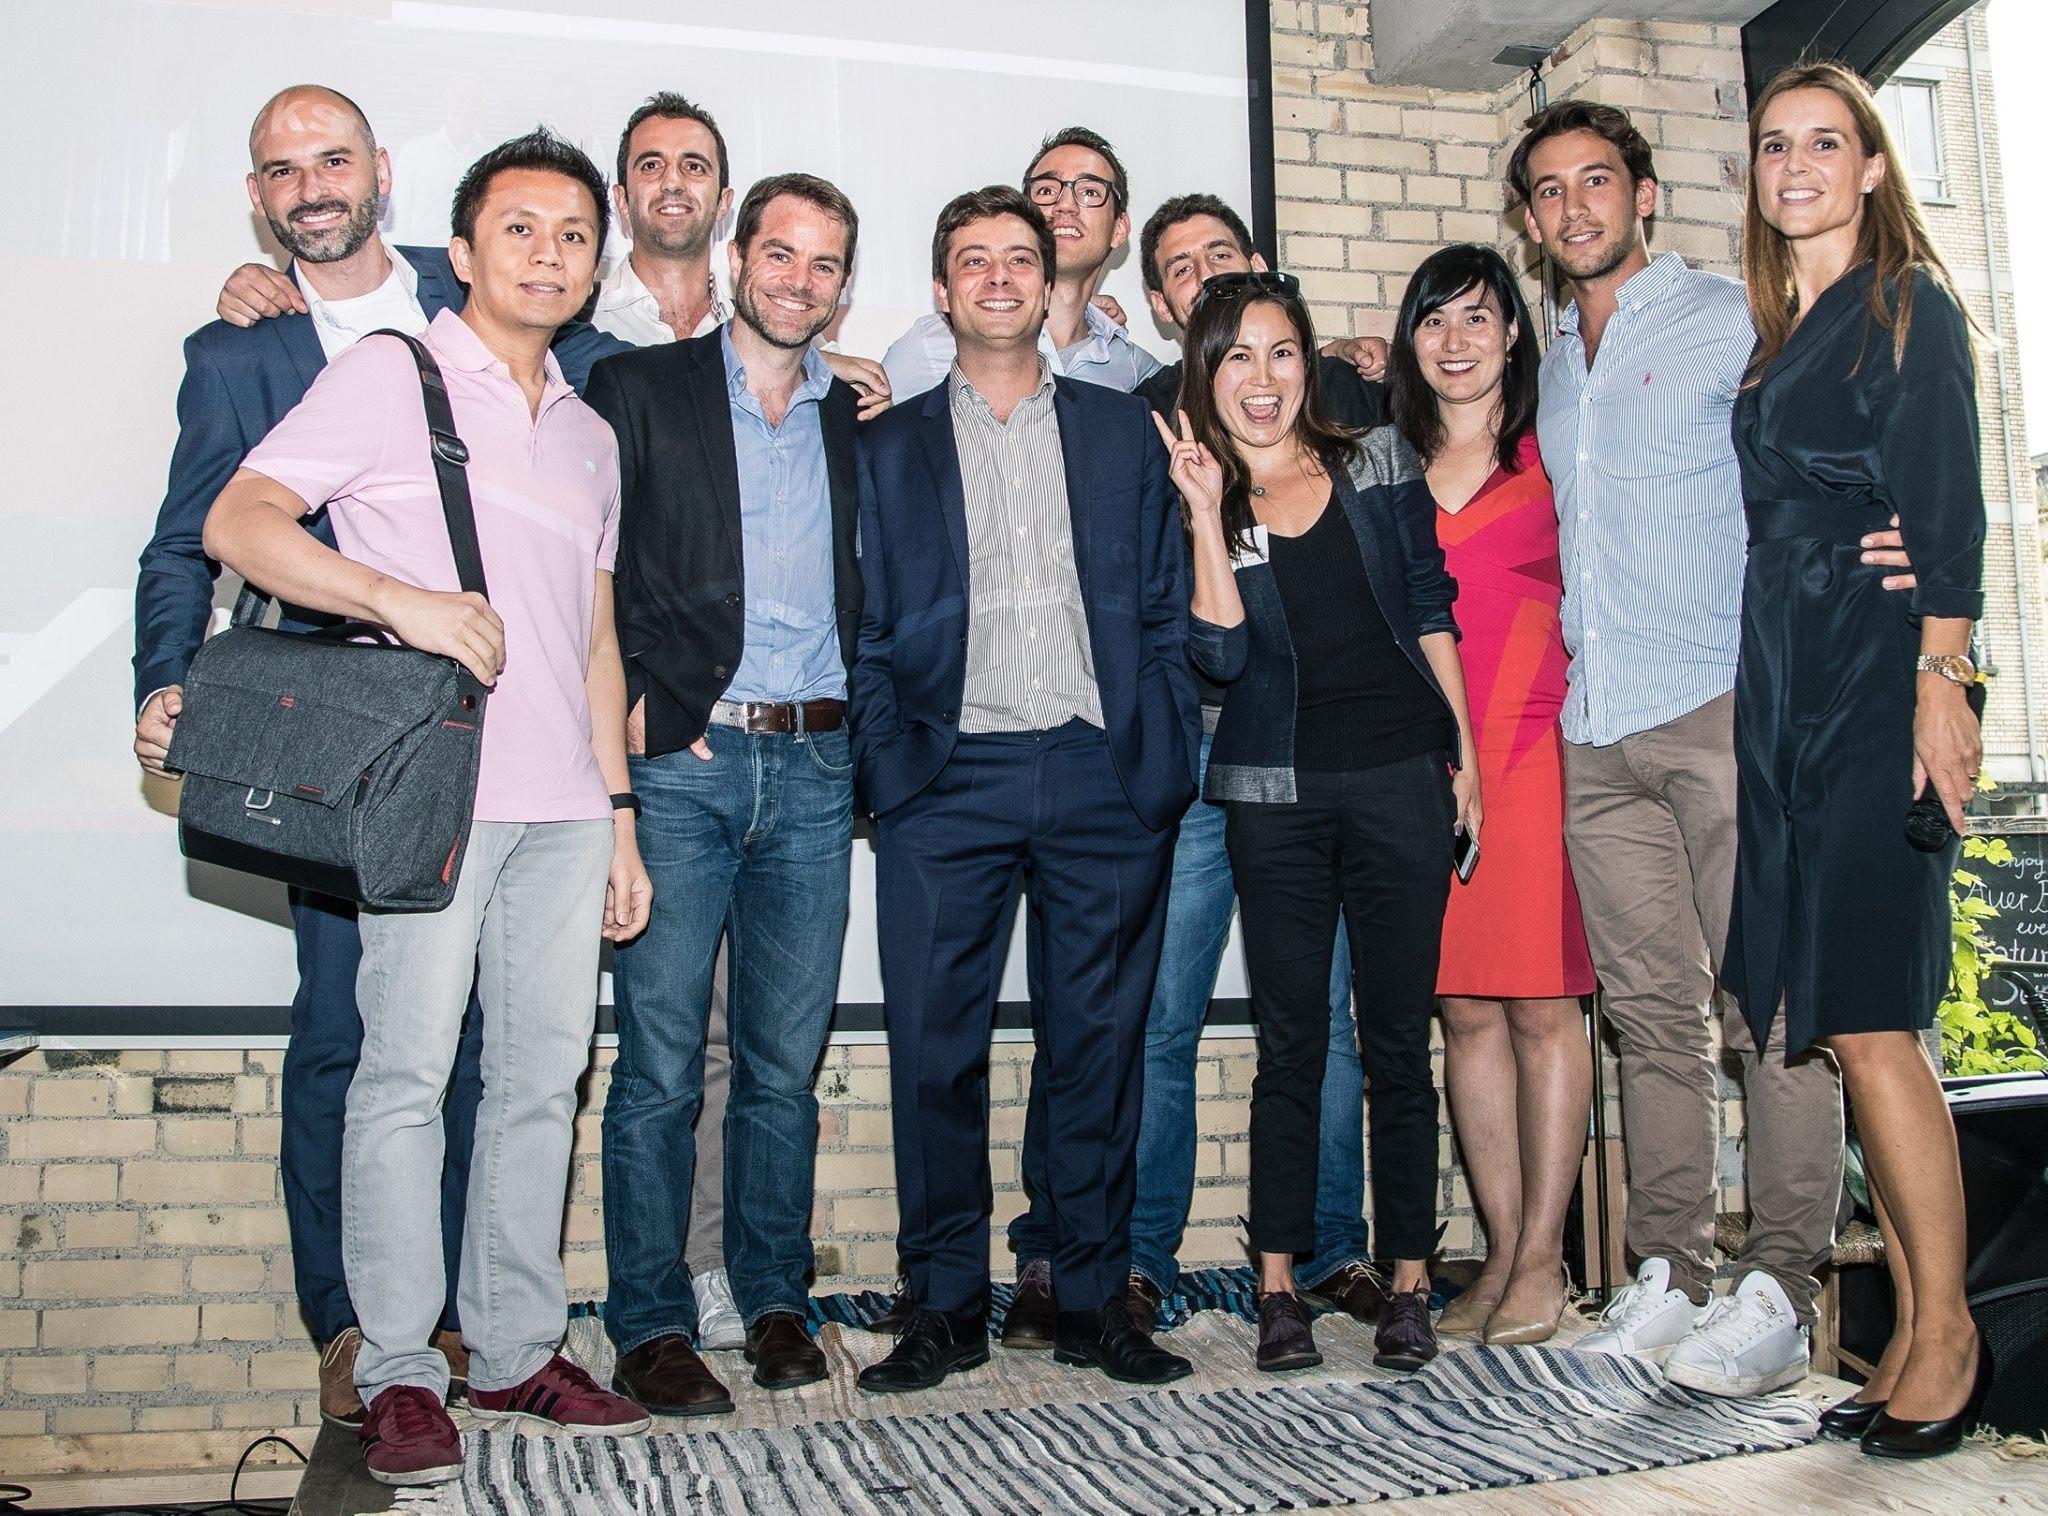 8 Smart-City Start-ups and 1 Intrapreneur team will join the Kickstart Accelerator in September